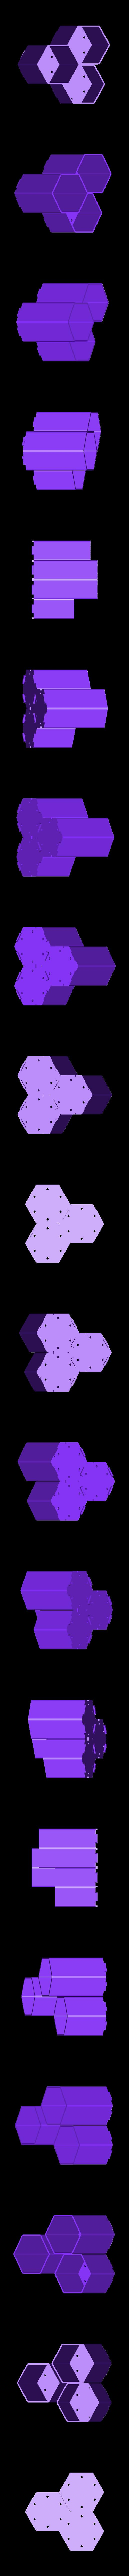 Hex_Planter.stl Download free STL file Simple Hexagon Planter • 3D printing model, DragonflyFabrication